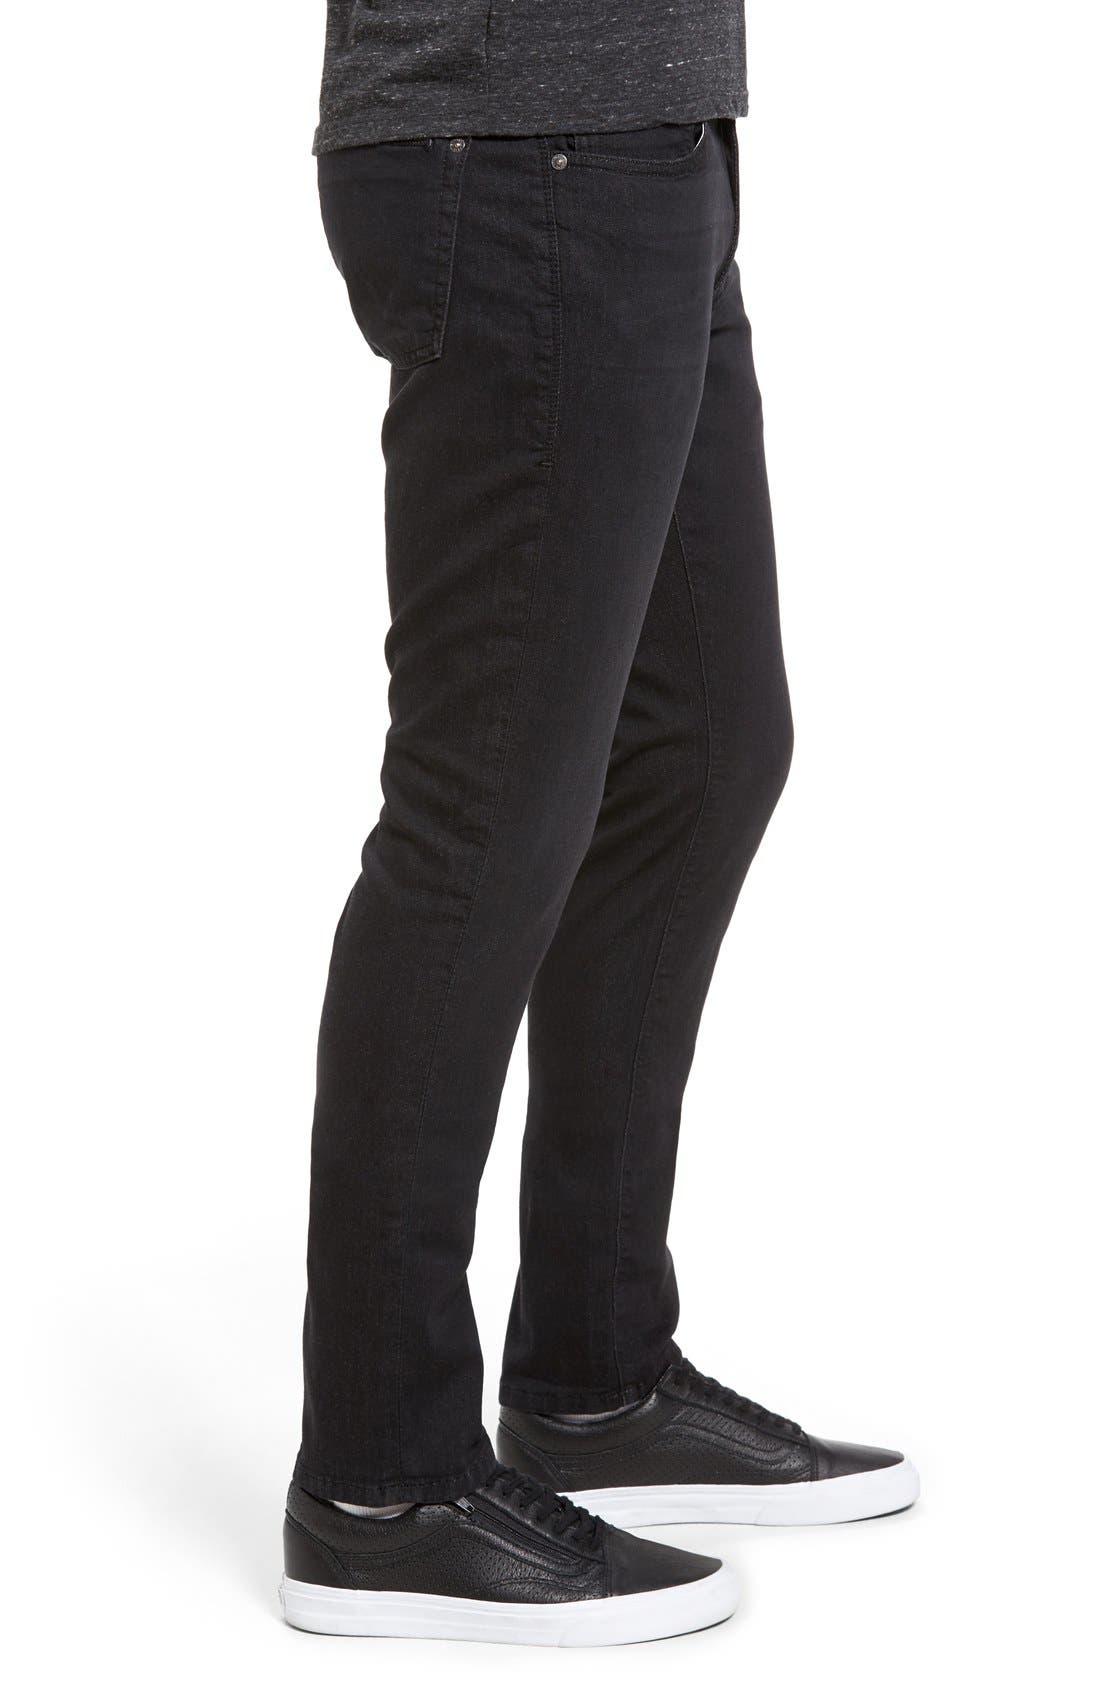 Torino Slim Fit Jeans,                             Alternate thumbnail 6, color,                             001